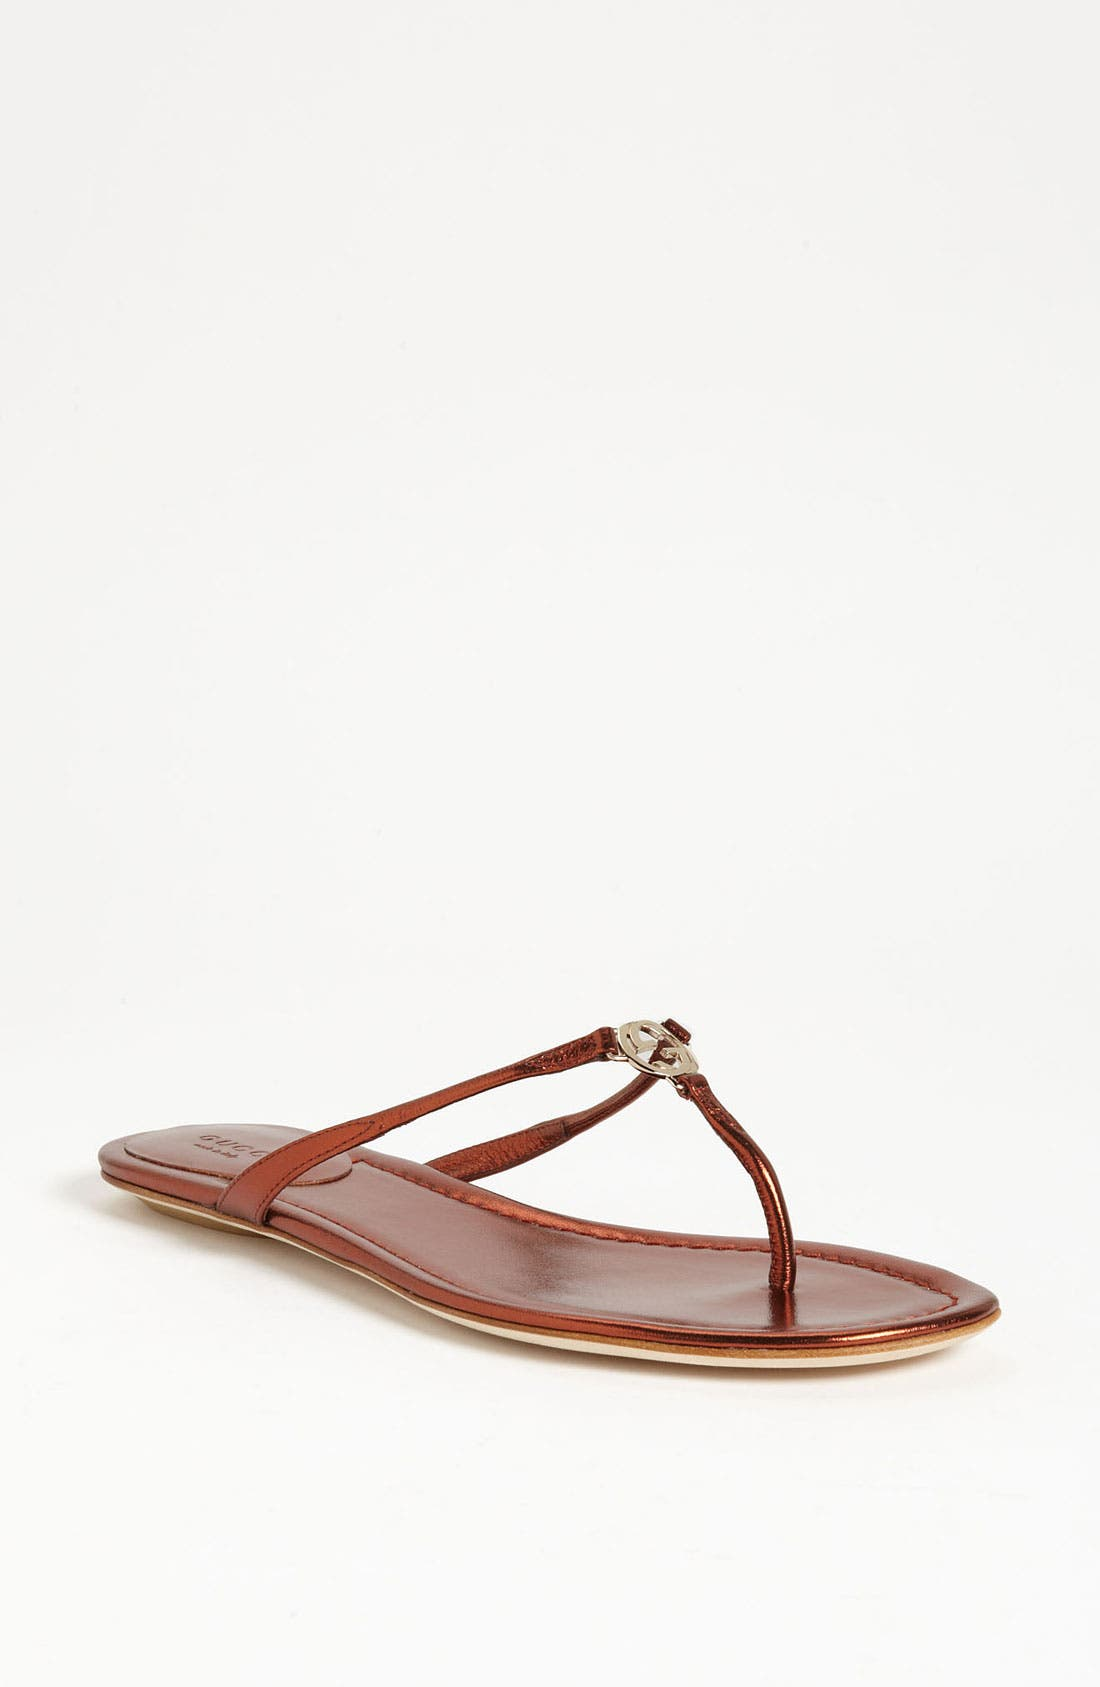 Main Image - Gucci 'Elaine' Thong Sandal